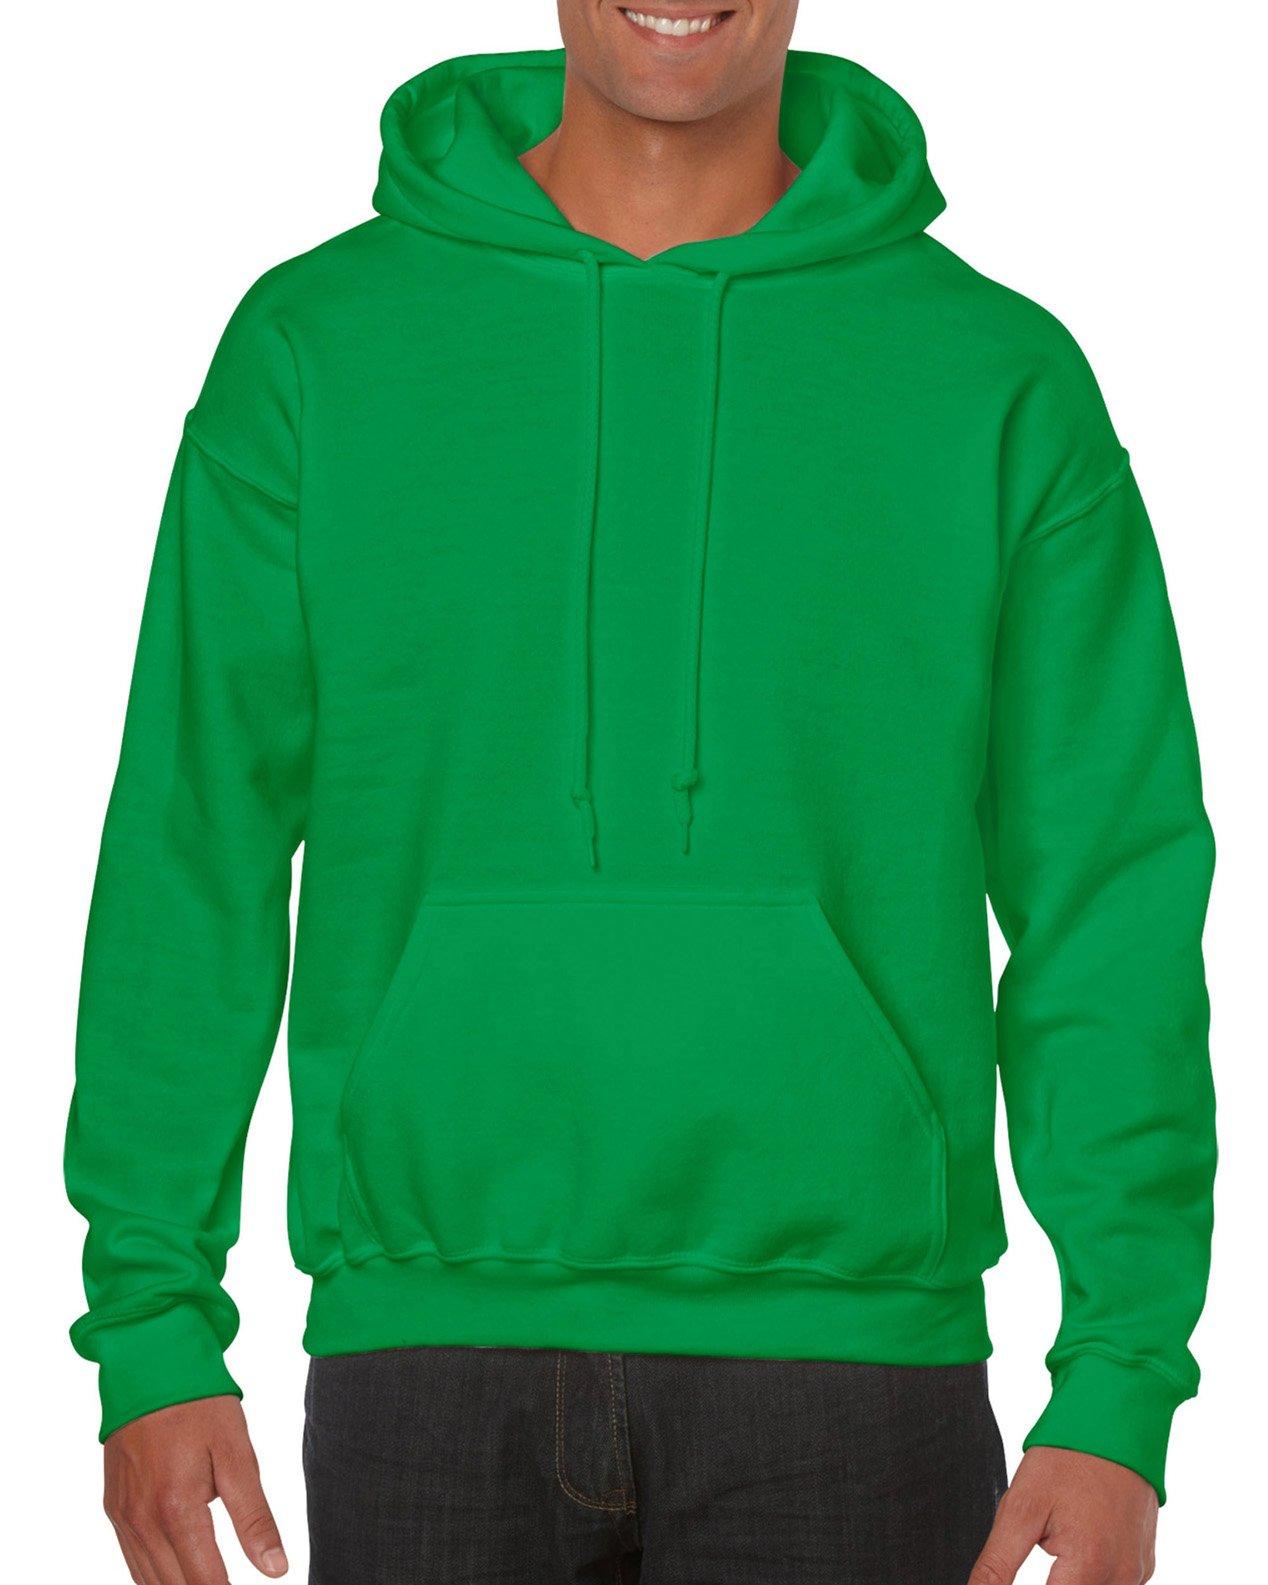 Gildan Men's Big and Tall Heavy Blend Fleece Hooded Sweatshirt G18500, Irish Green, 2X-Large by Gildan